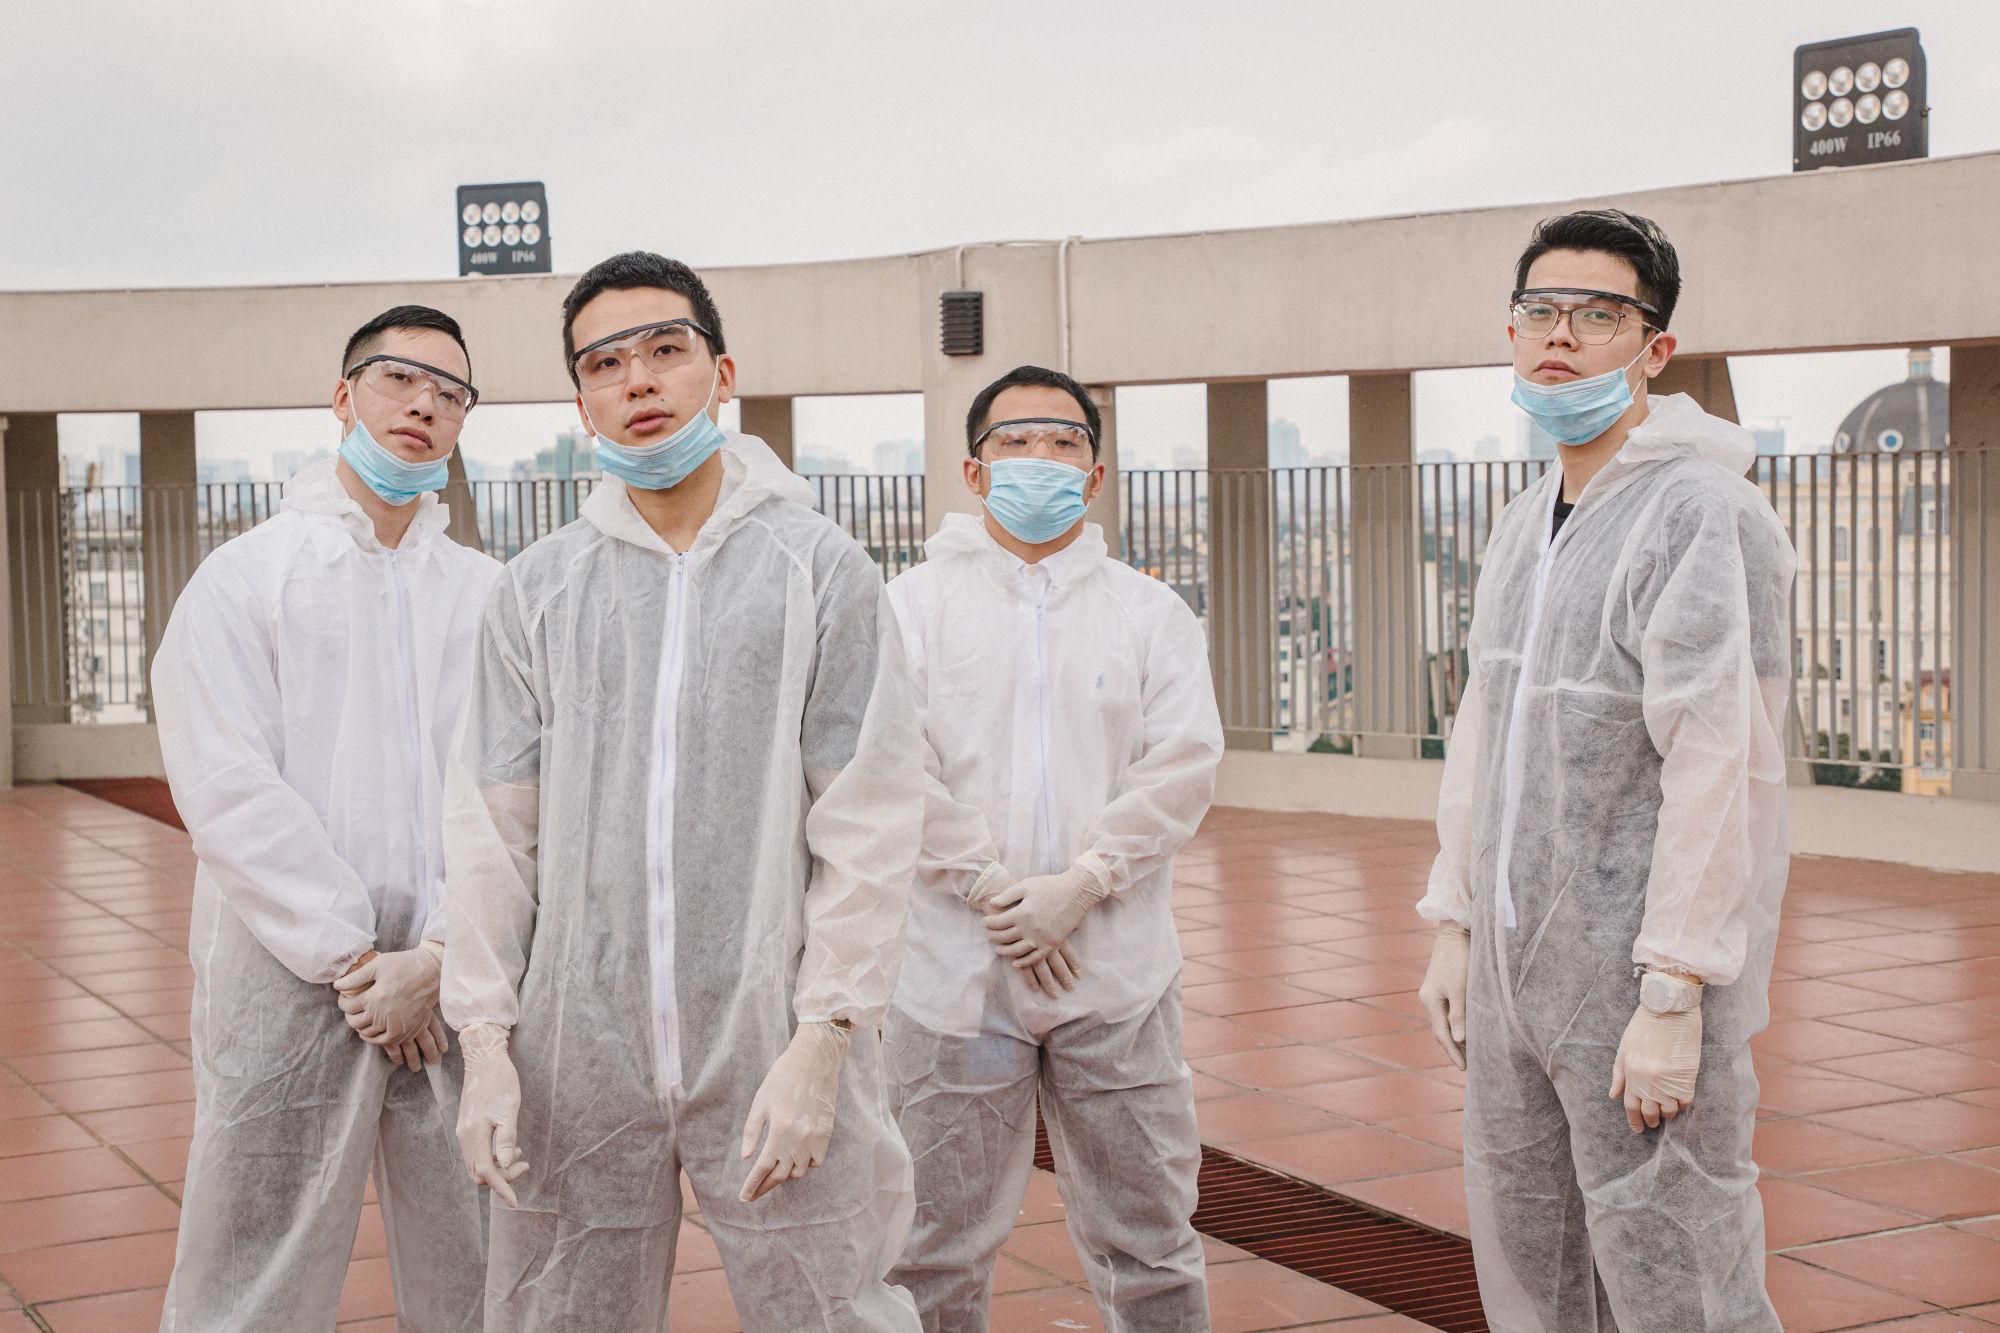 DaLab 说唱音乐团表演的《对虚假新闻说不》歌曲在新冠肺炎疫情中已创造出良好的效应。图自Vietnam+